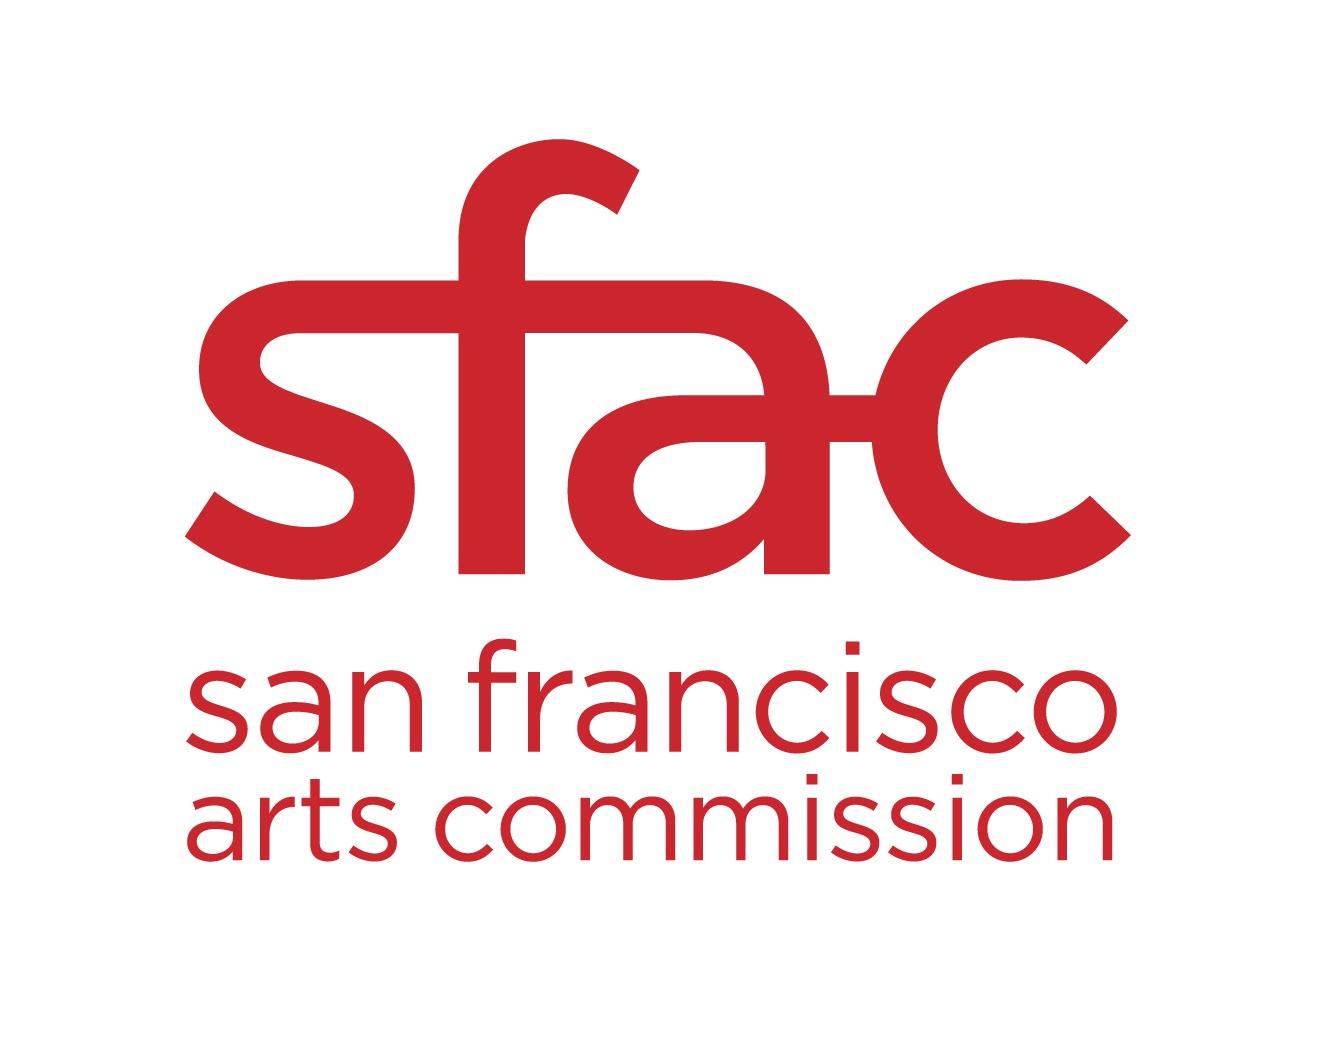 sfac-logo.jpg